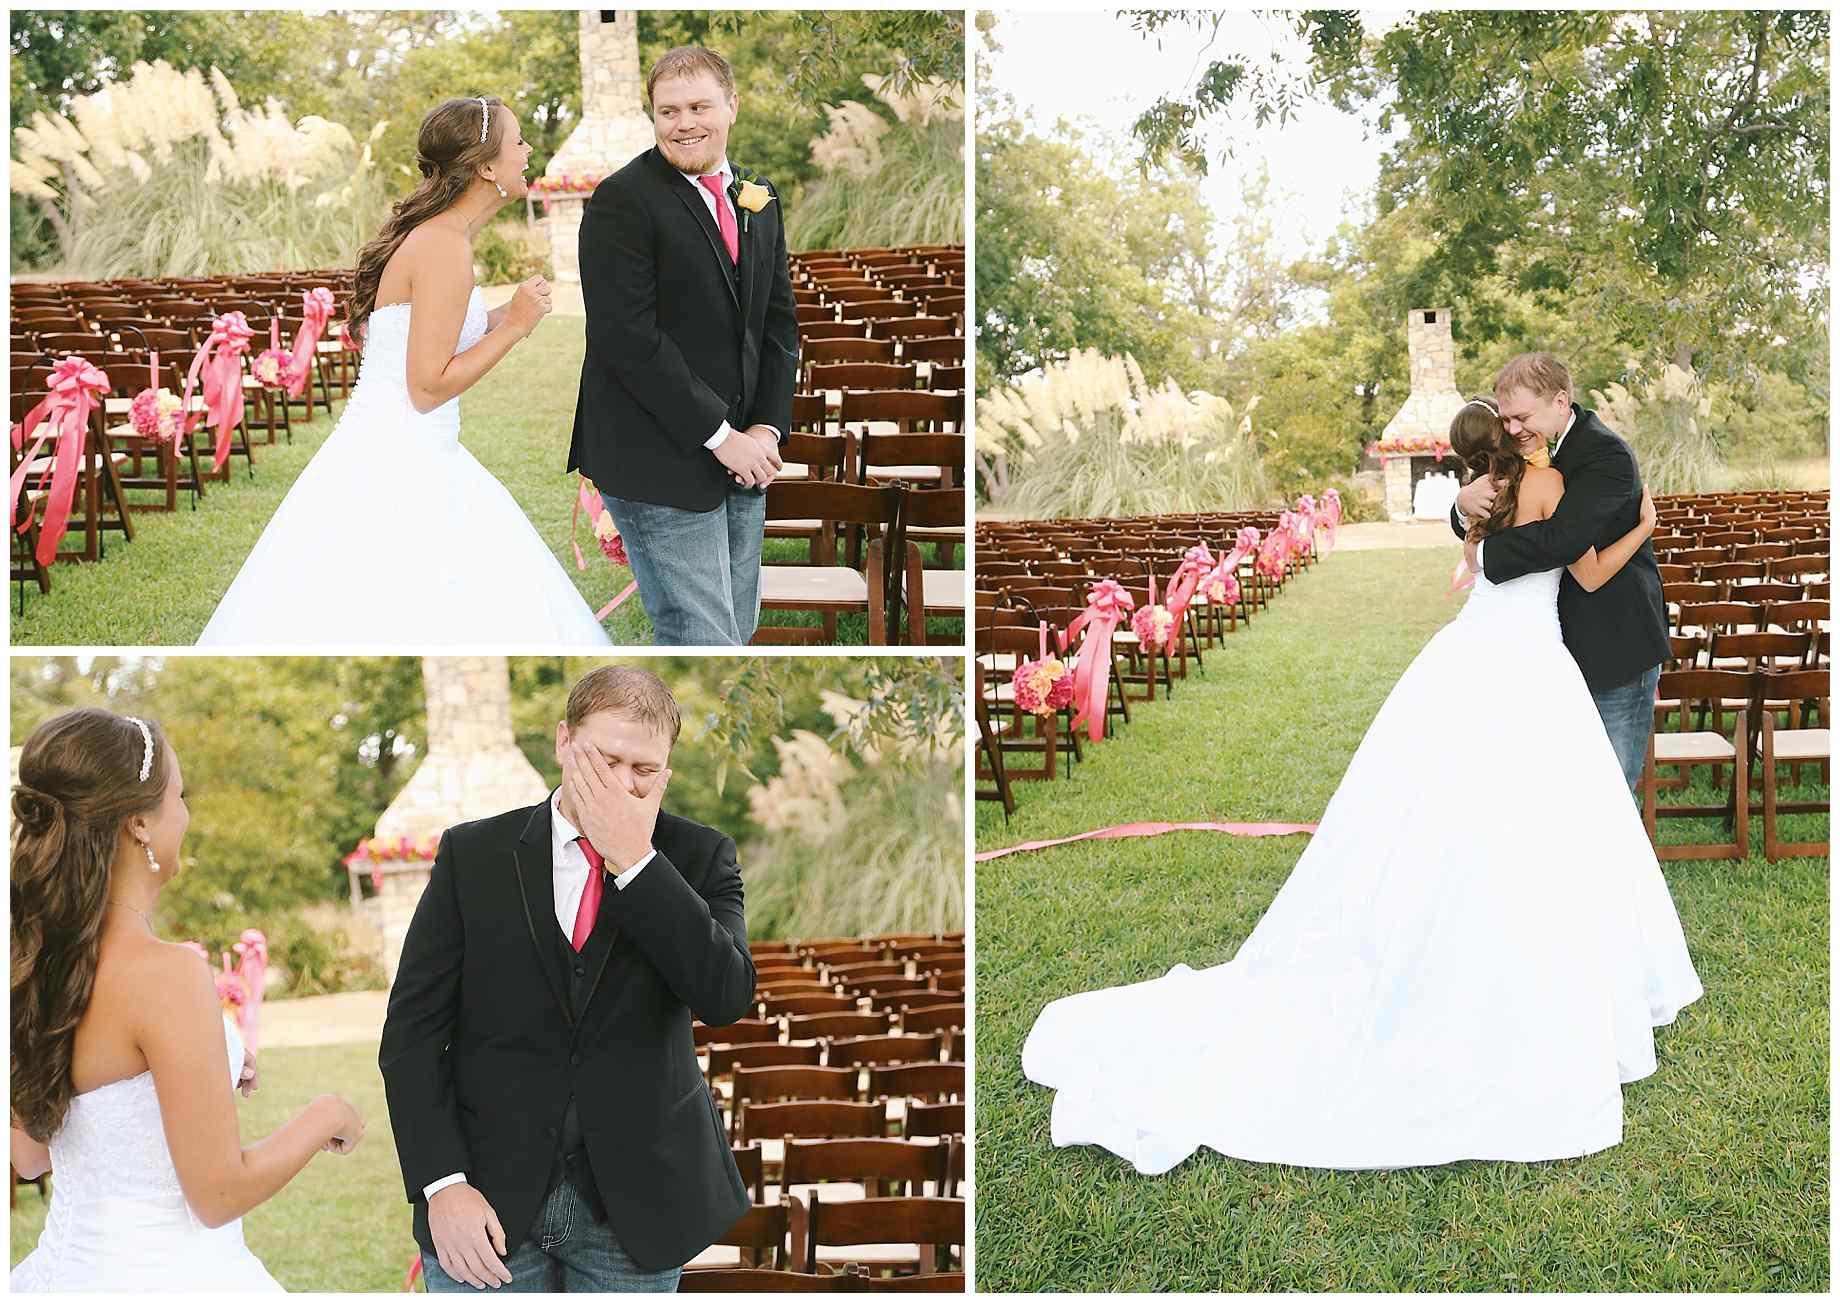 pecan-springs-ranch-austin-tx-wedding-005